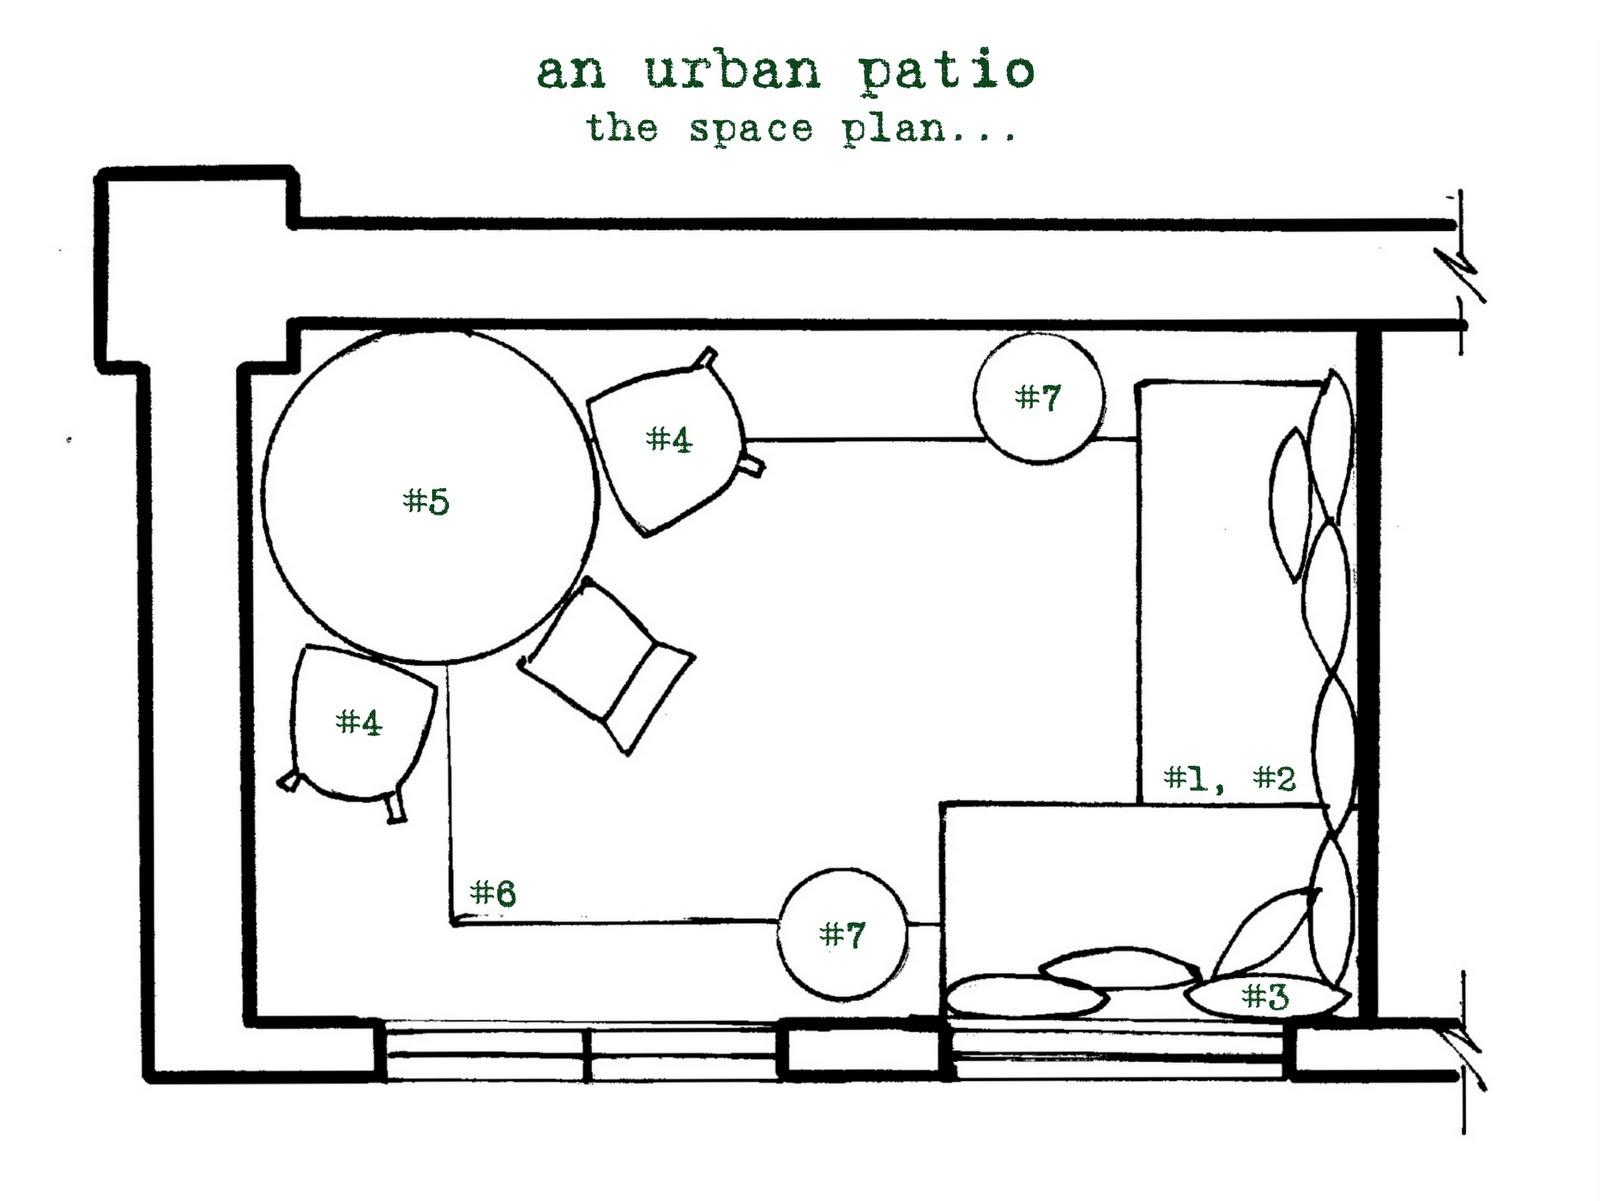 Genus Loci An Urban Patio Plan